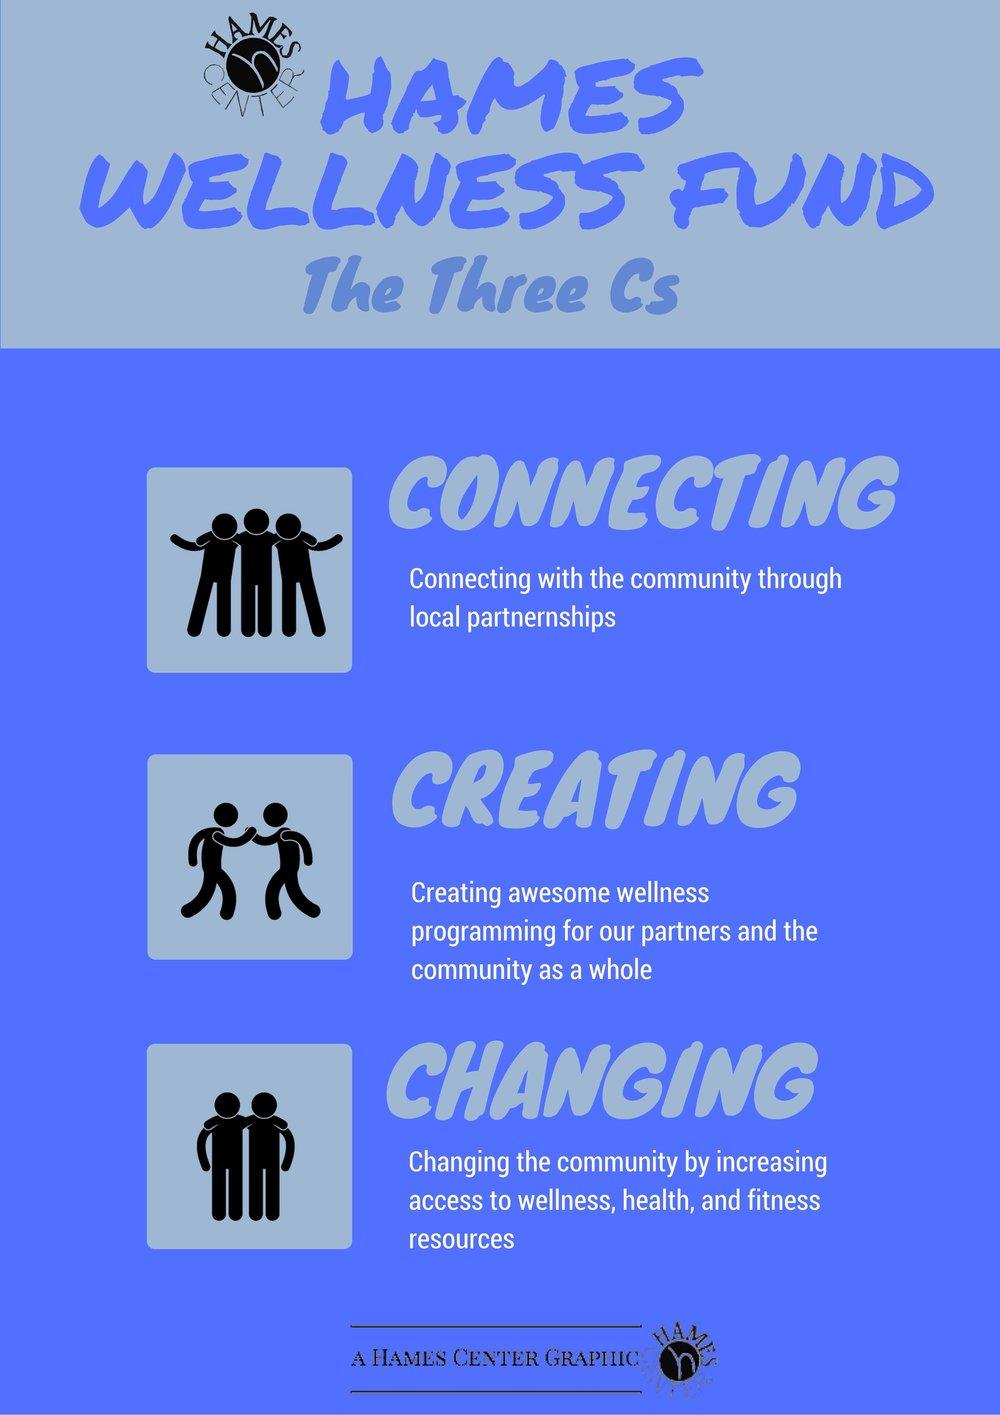 Hames Wellness Fund 3 cs poster.jpg